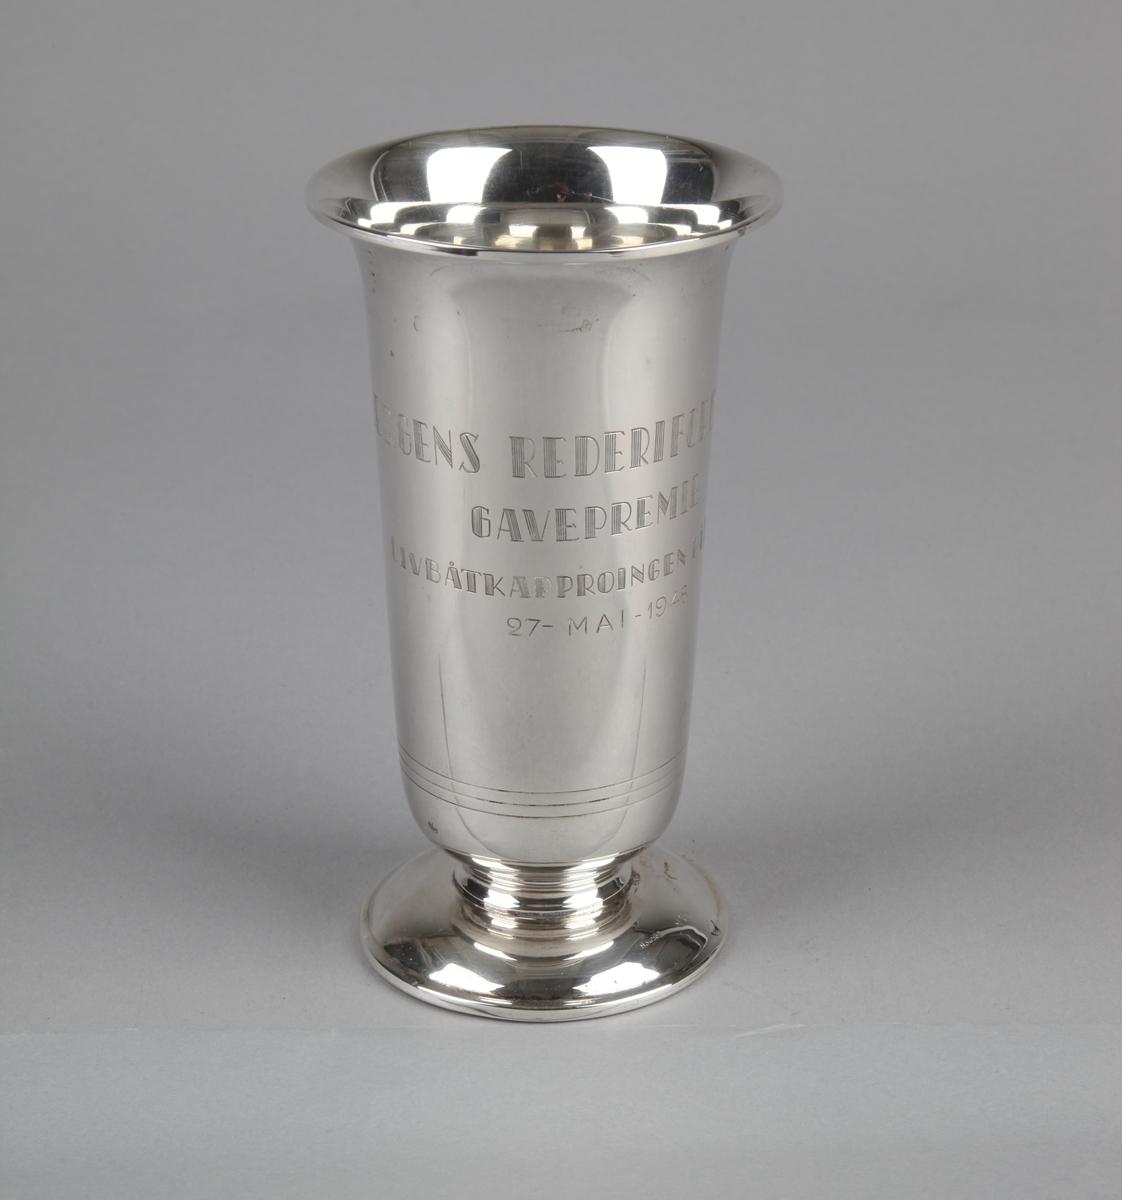 Sølvpokal fra Bergens Rederiforening gitt til bjergningsdamper SALVAGE i1948.